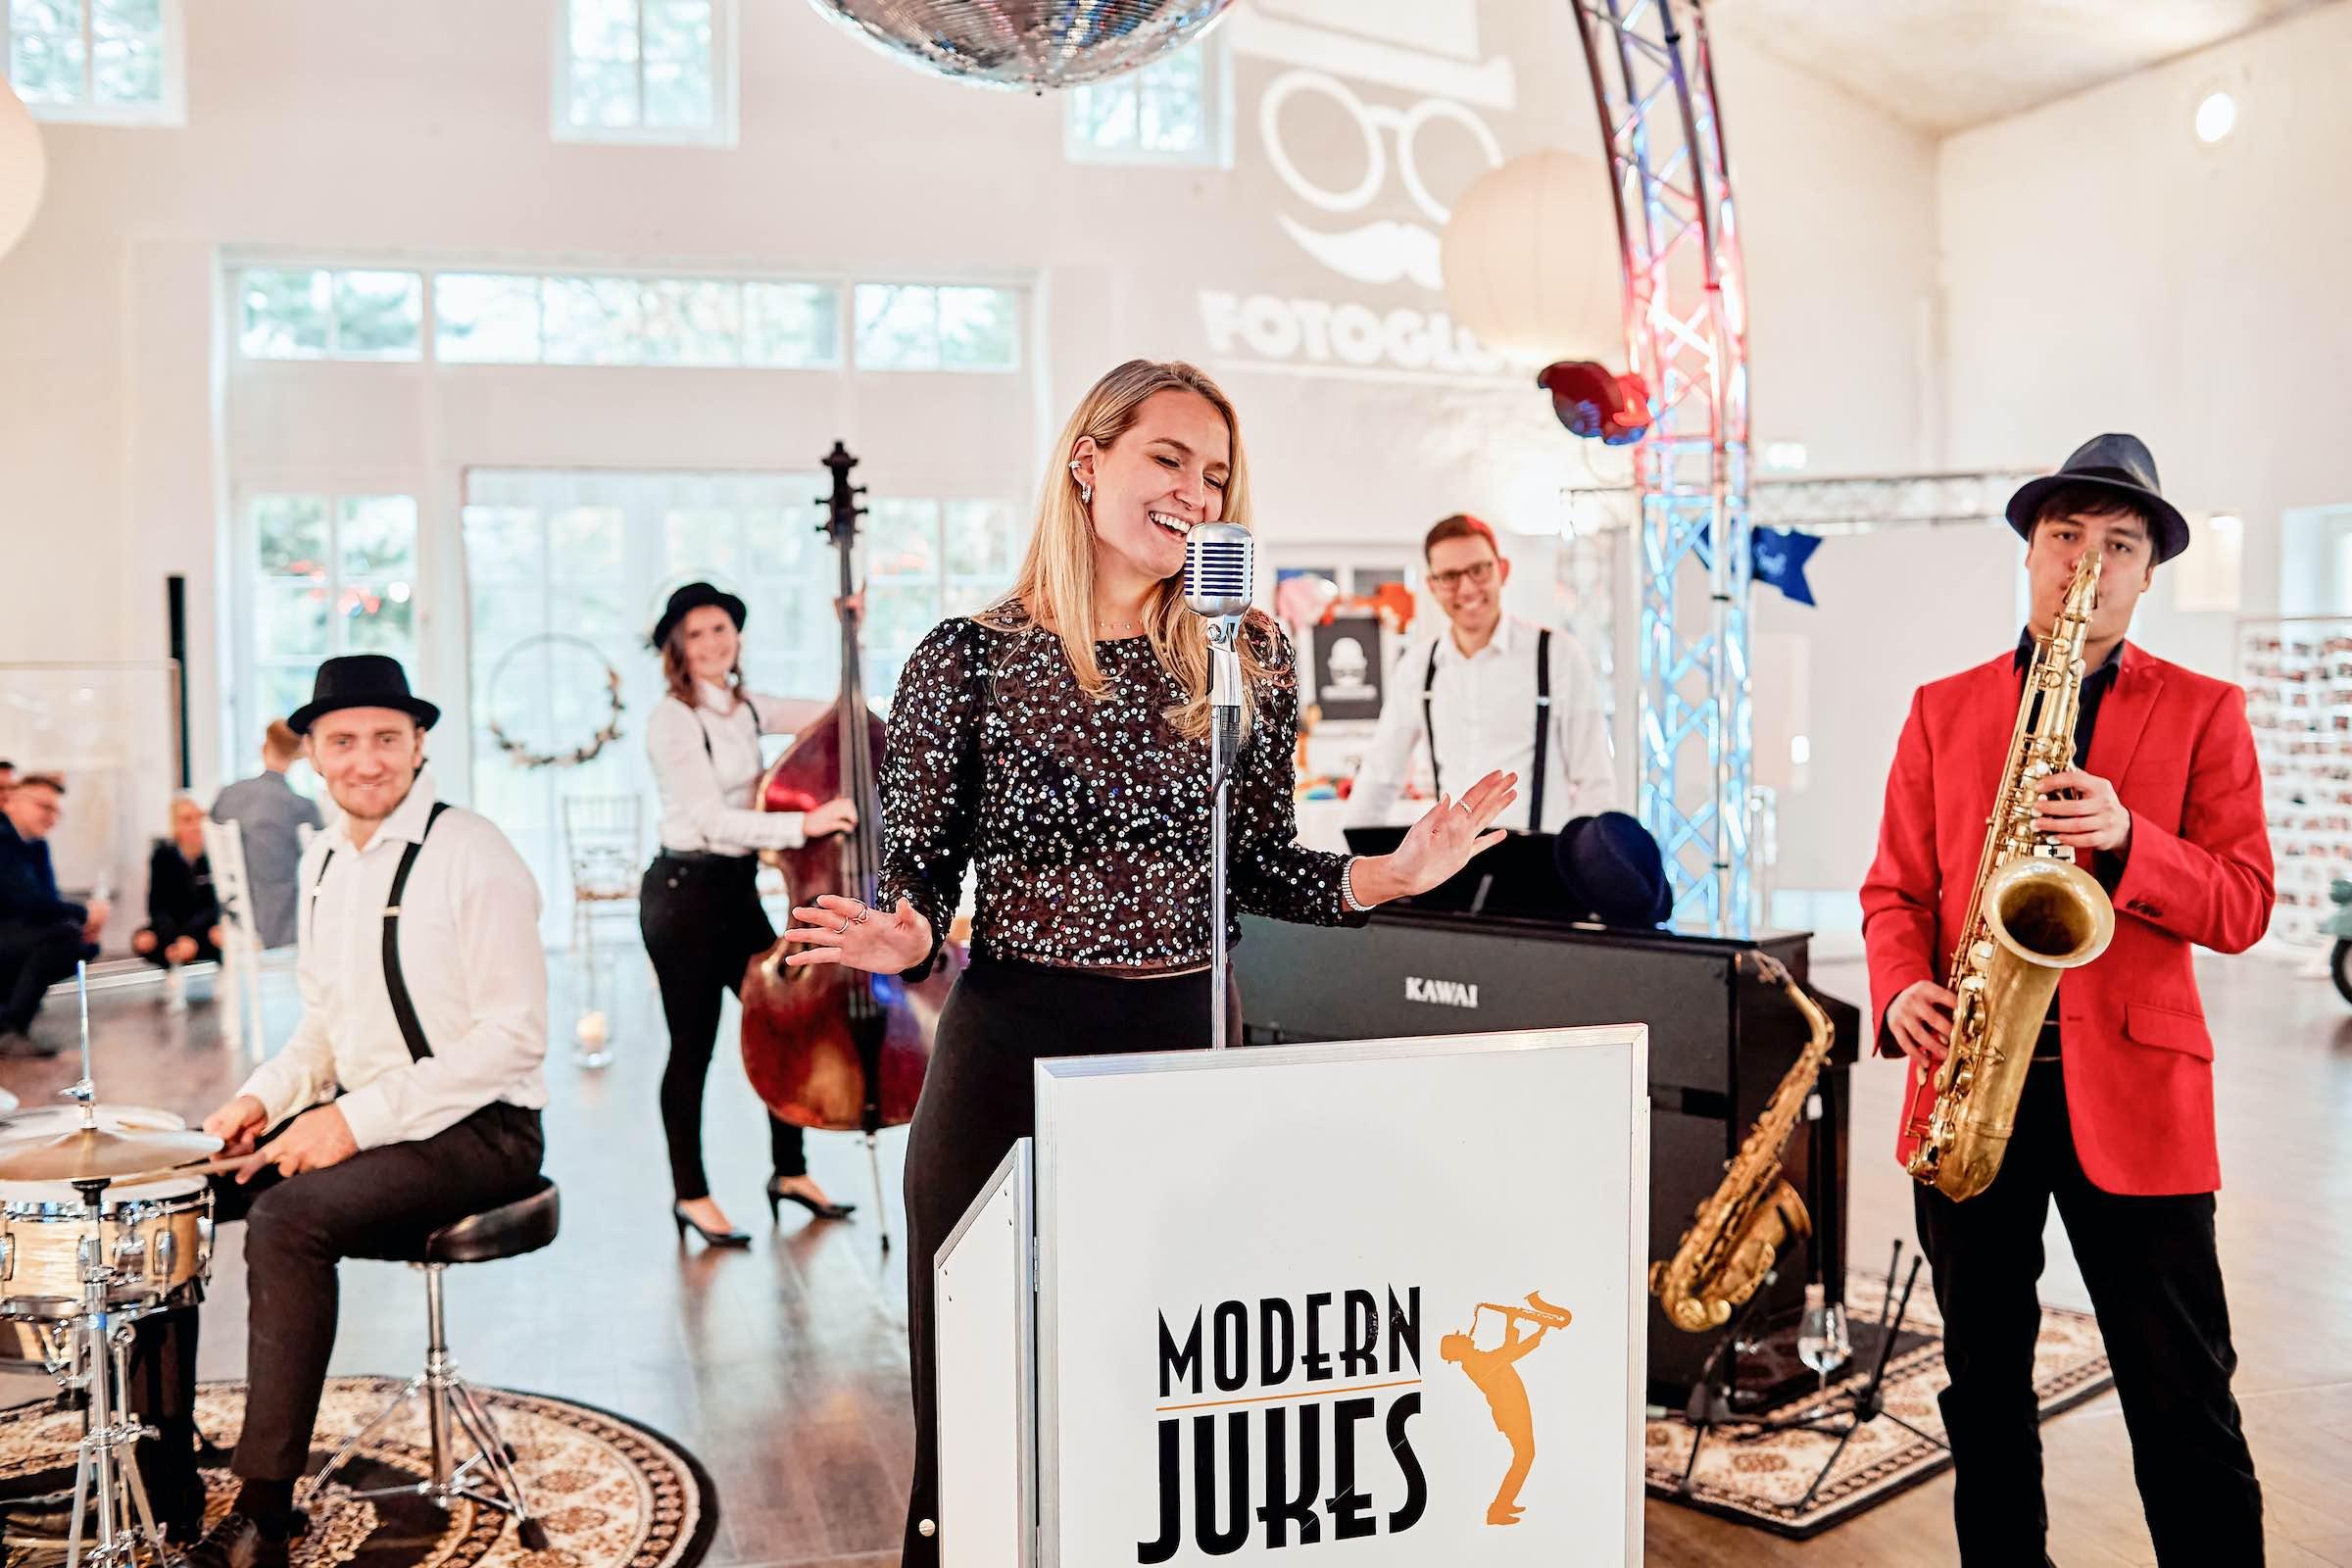 Band | Event | Hannover | Buchen | Popband | Partyband | Sektempfang | Party | Trauung | Dinner | Buchen | Mieten | Modern | Jukes